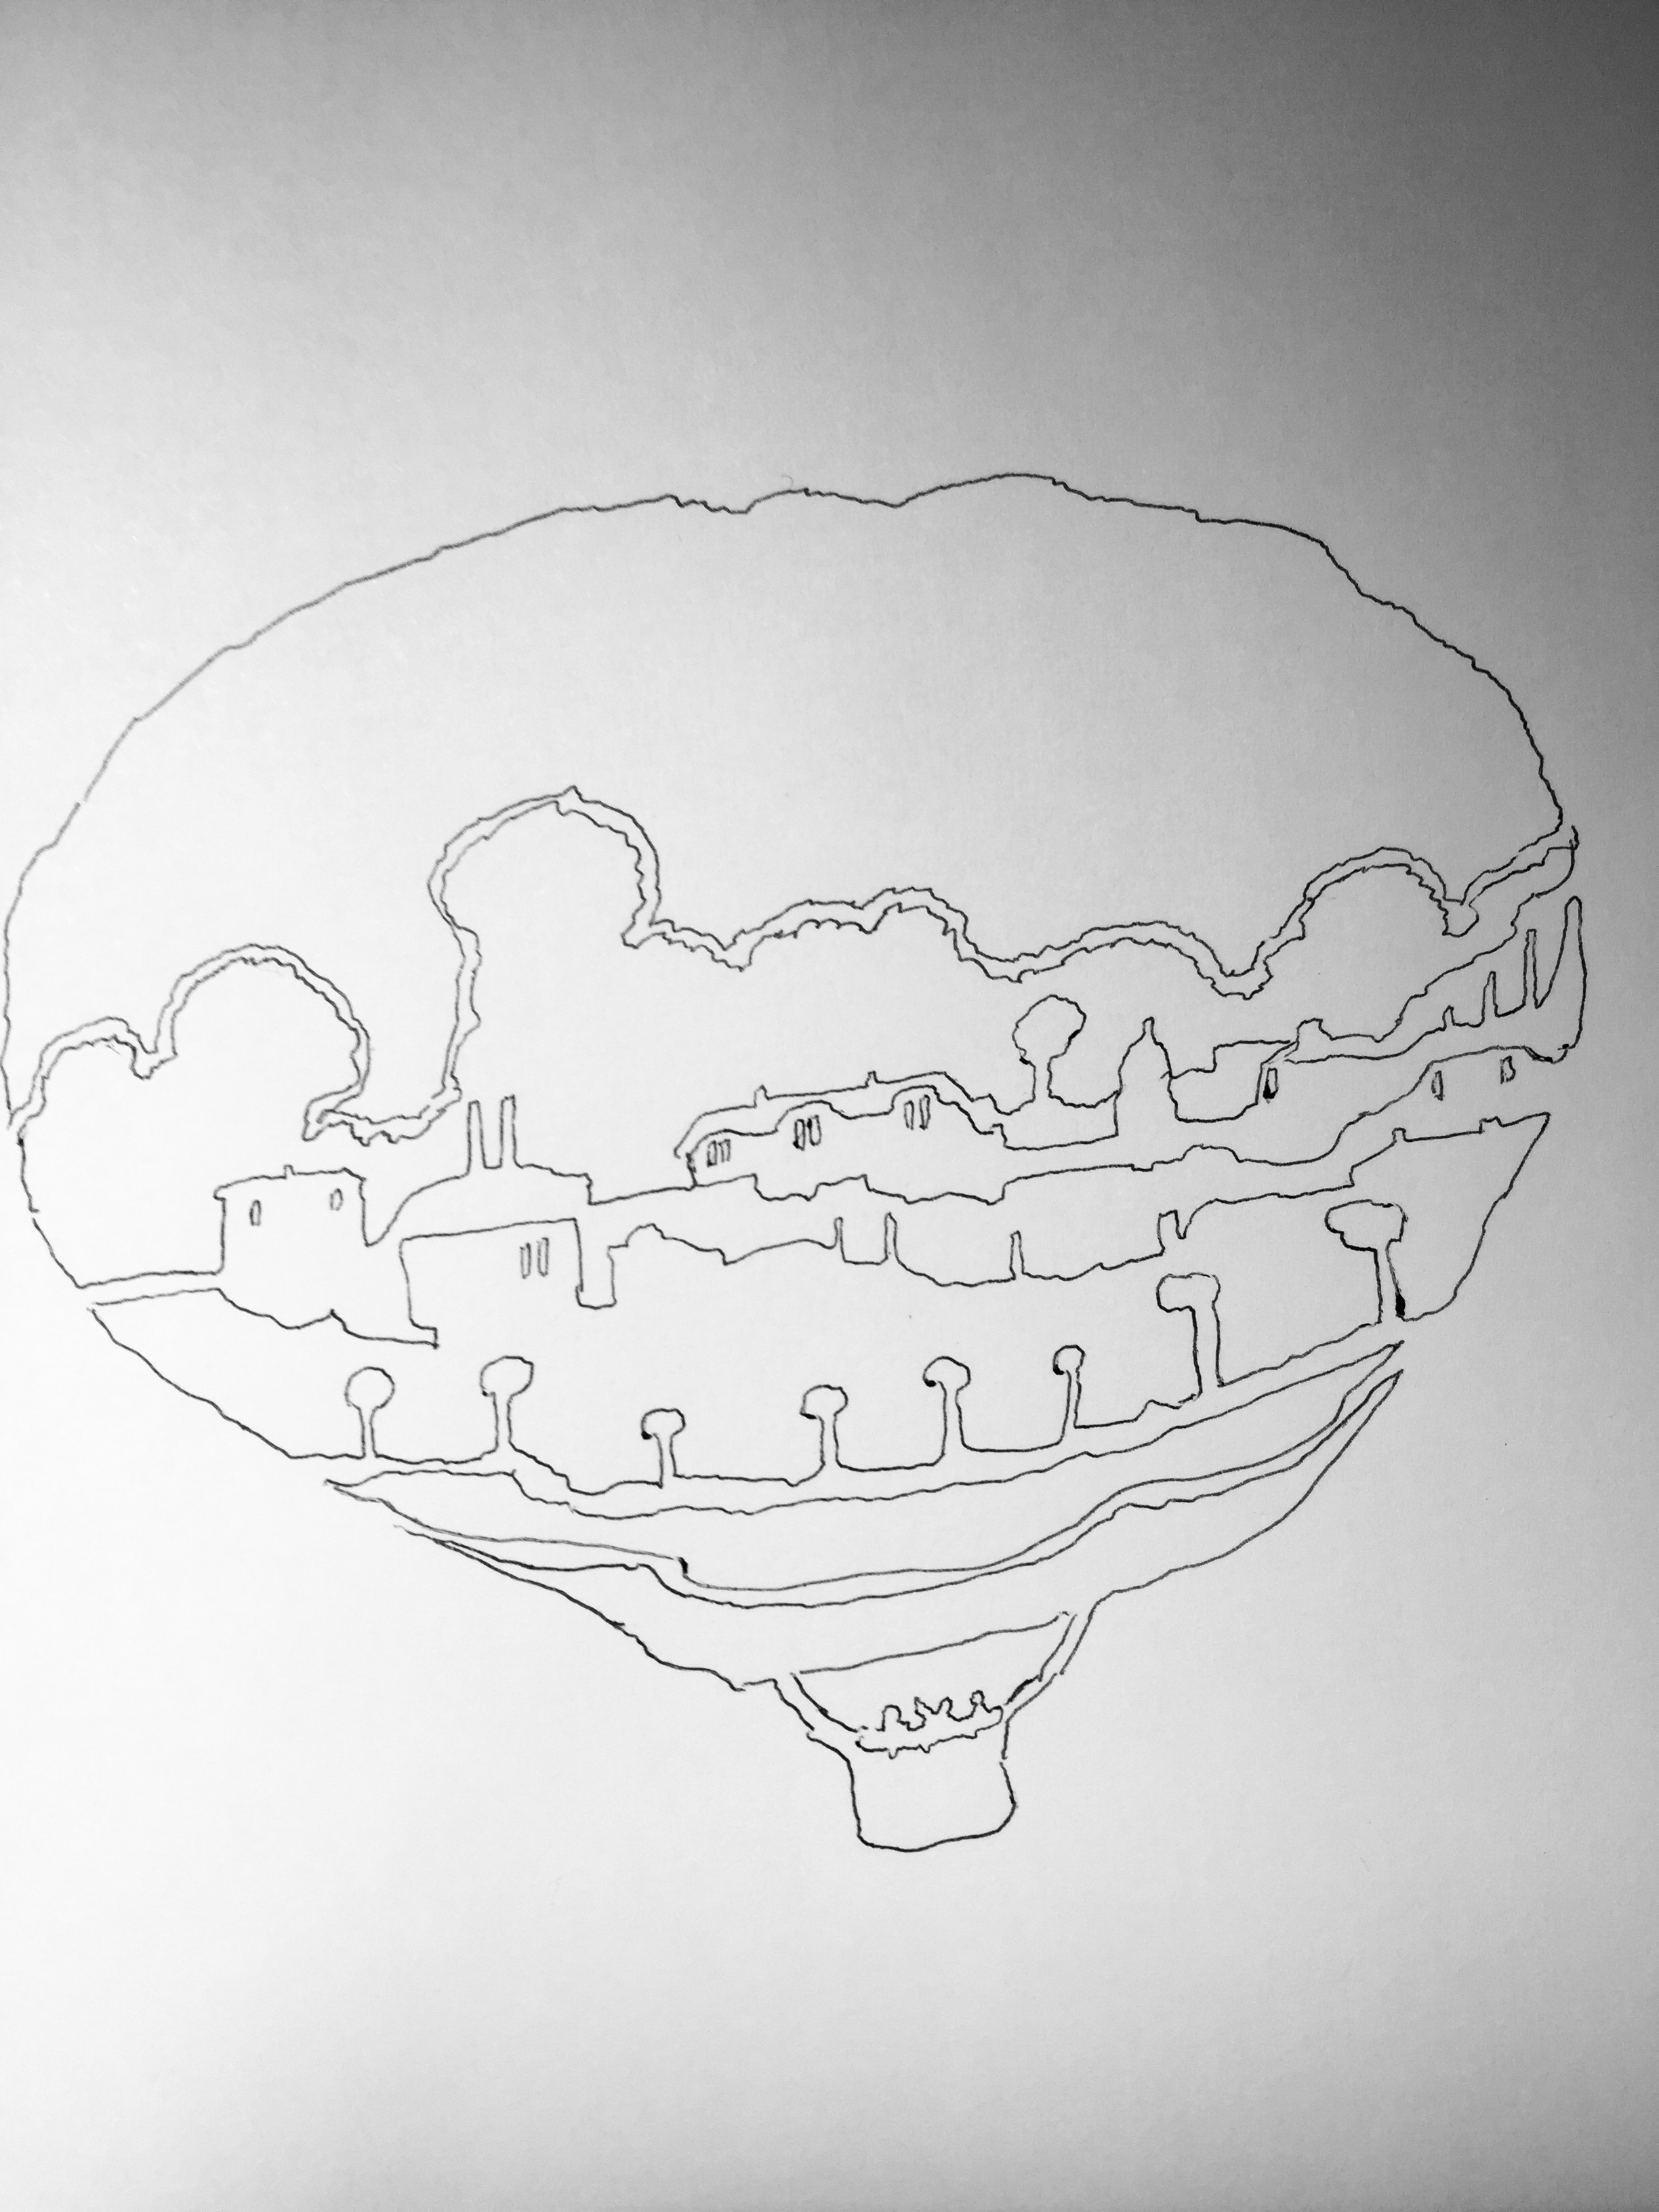 Balloon with world (monochrome)